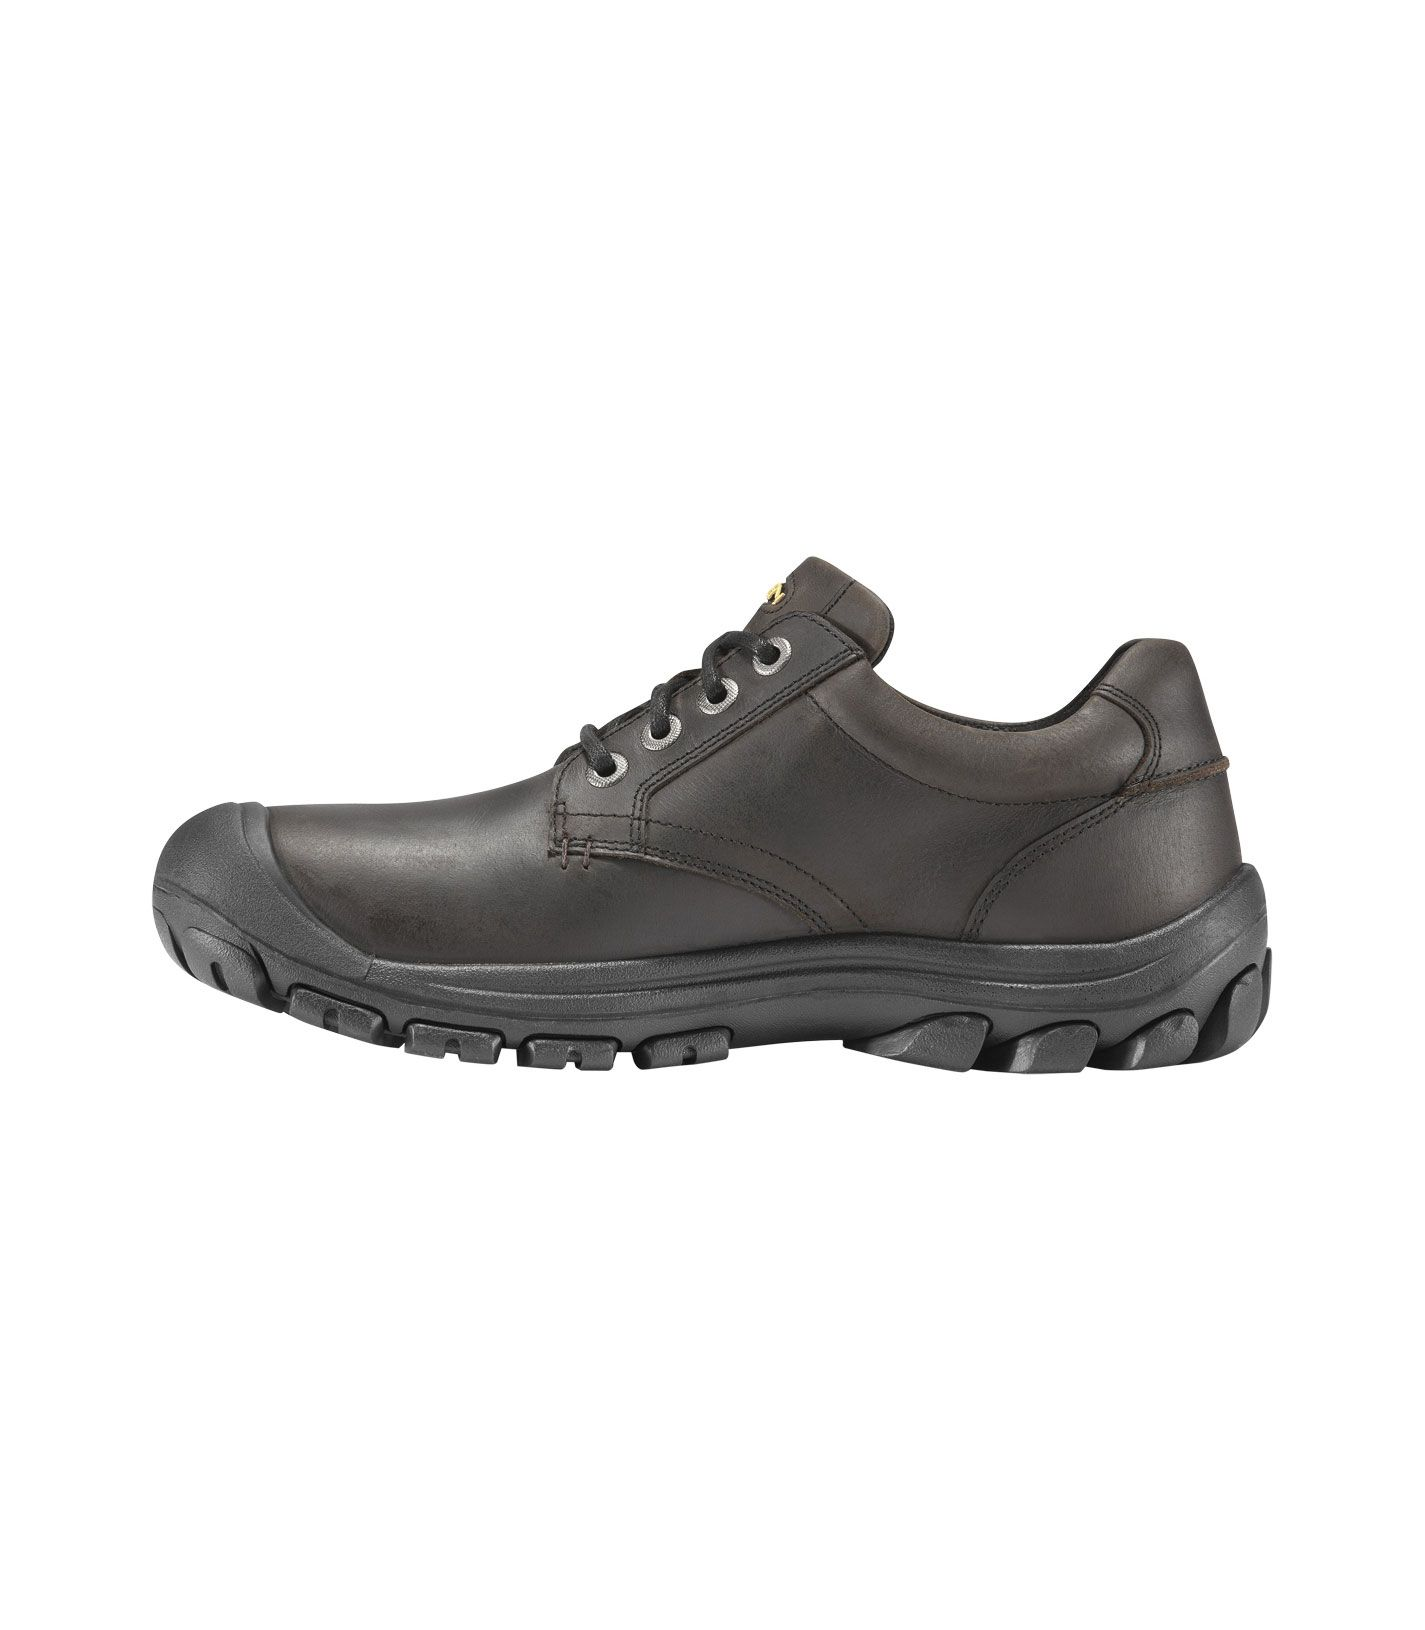 Keen Mens Shoes Clearance | Keen Mens